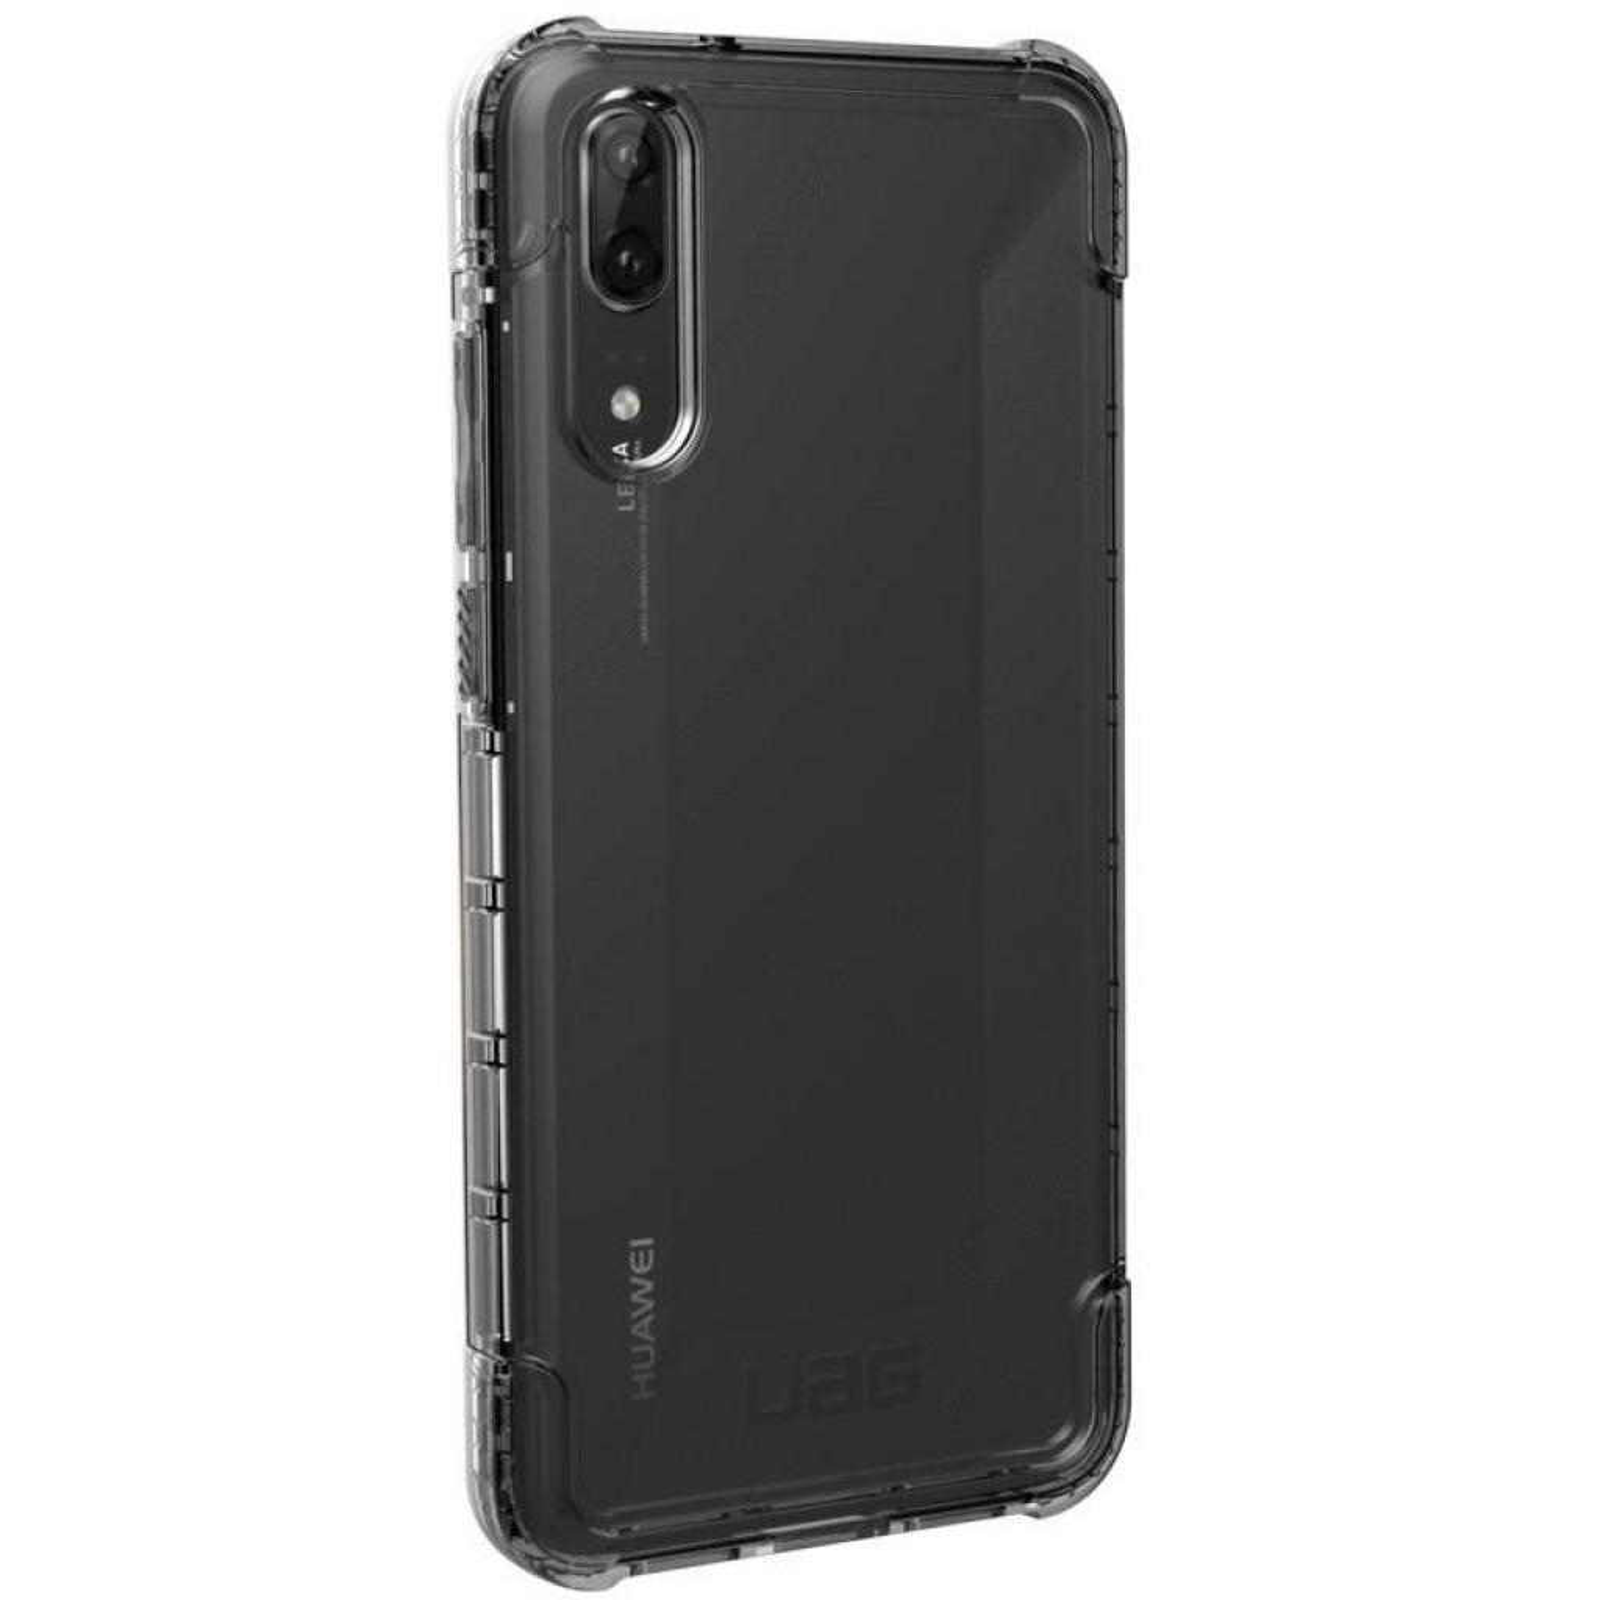 Чехол для моб. телефона Urban Armor Gear Huawei P20 Plyo Ice (HP20-Y-IC) изображение 2